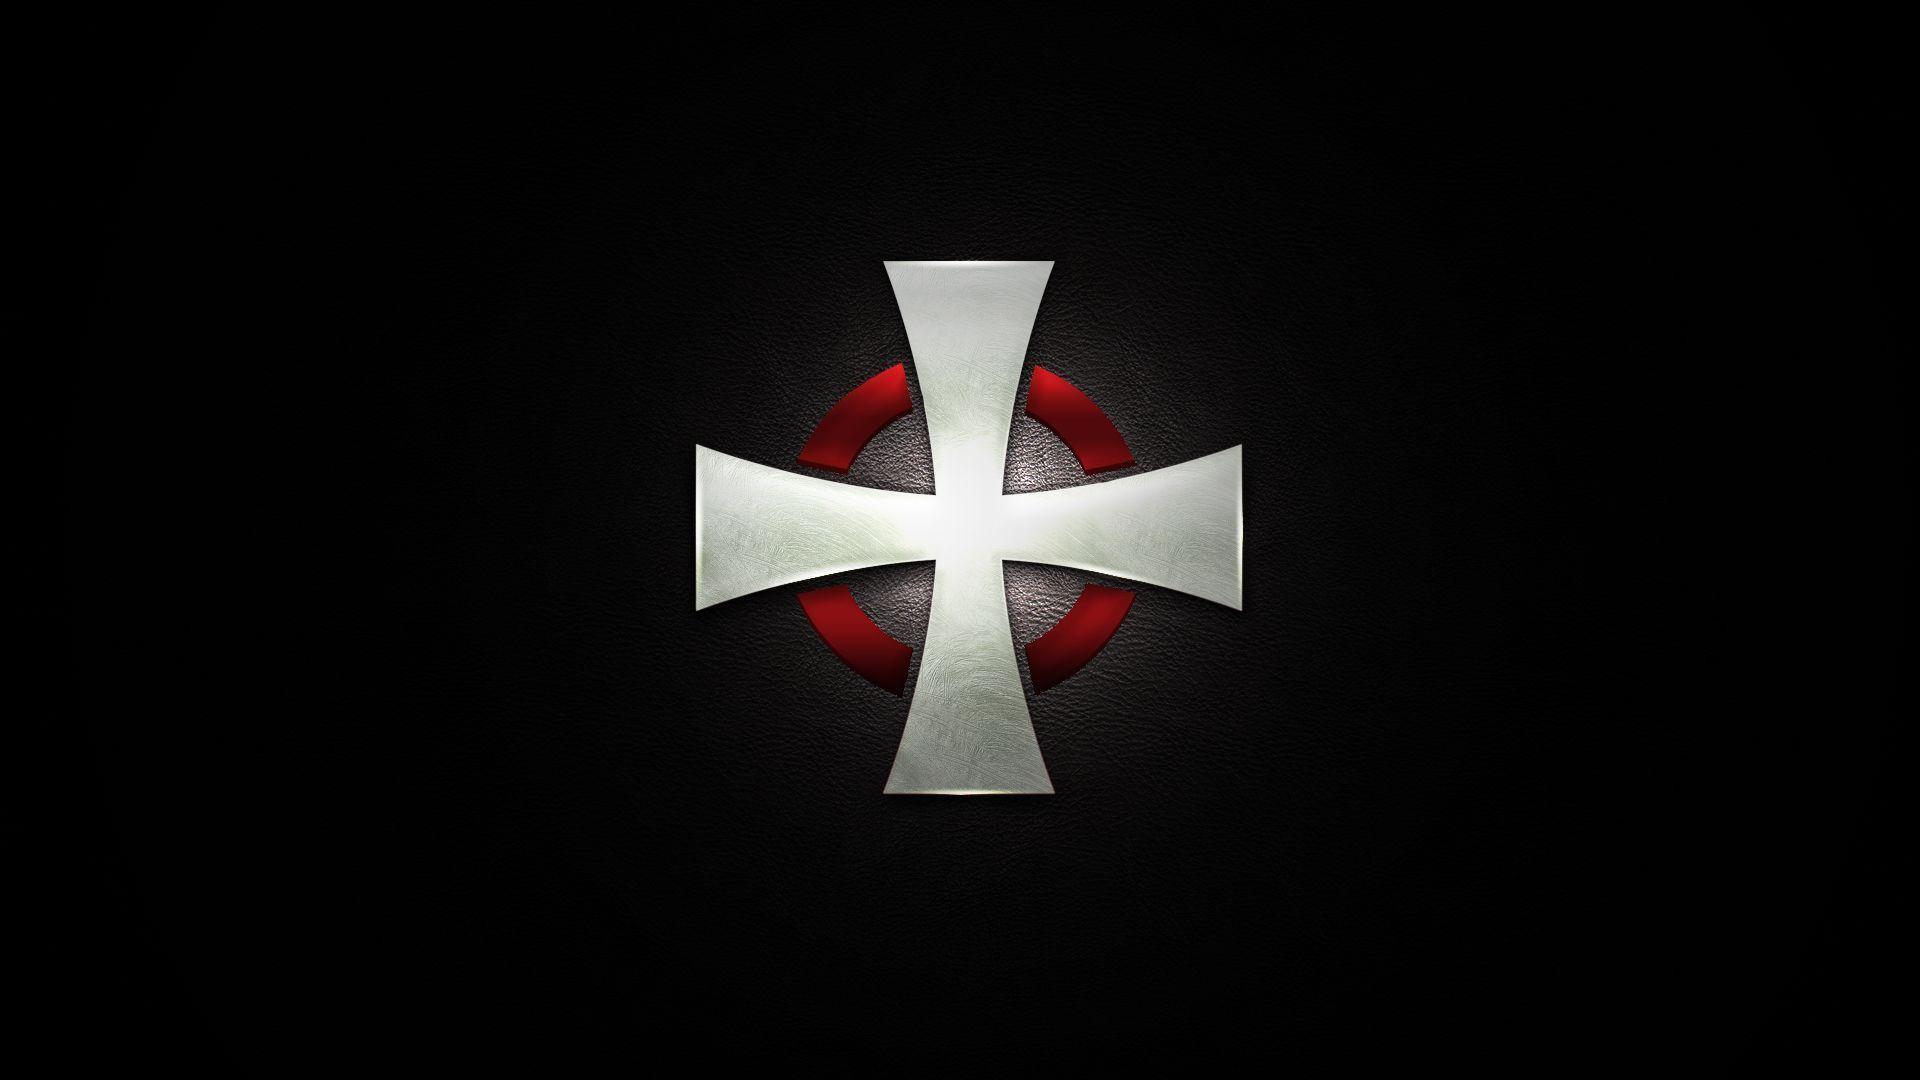 Knights Templar Wallpapers – Wallpaper Cave